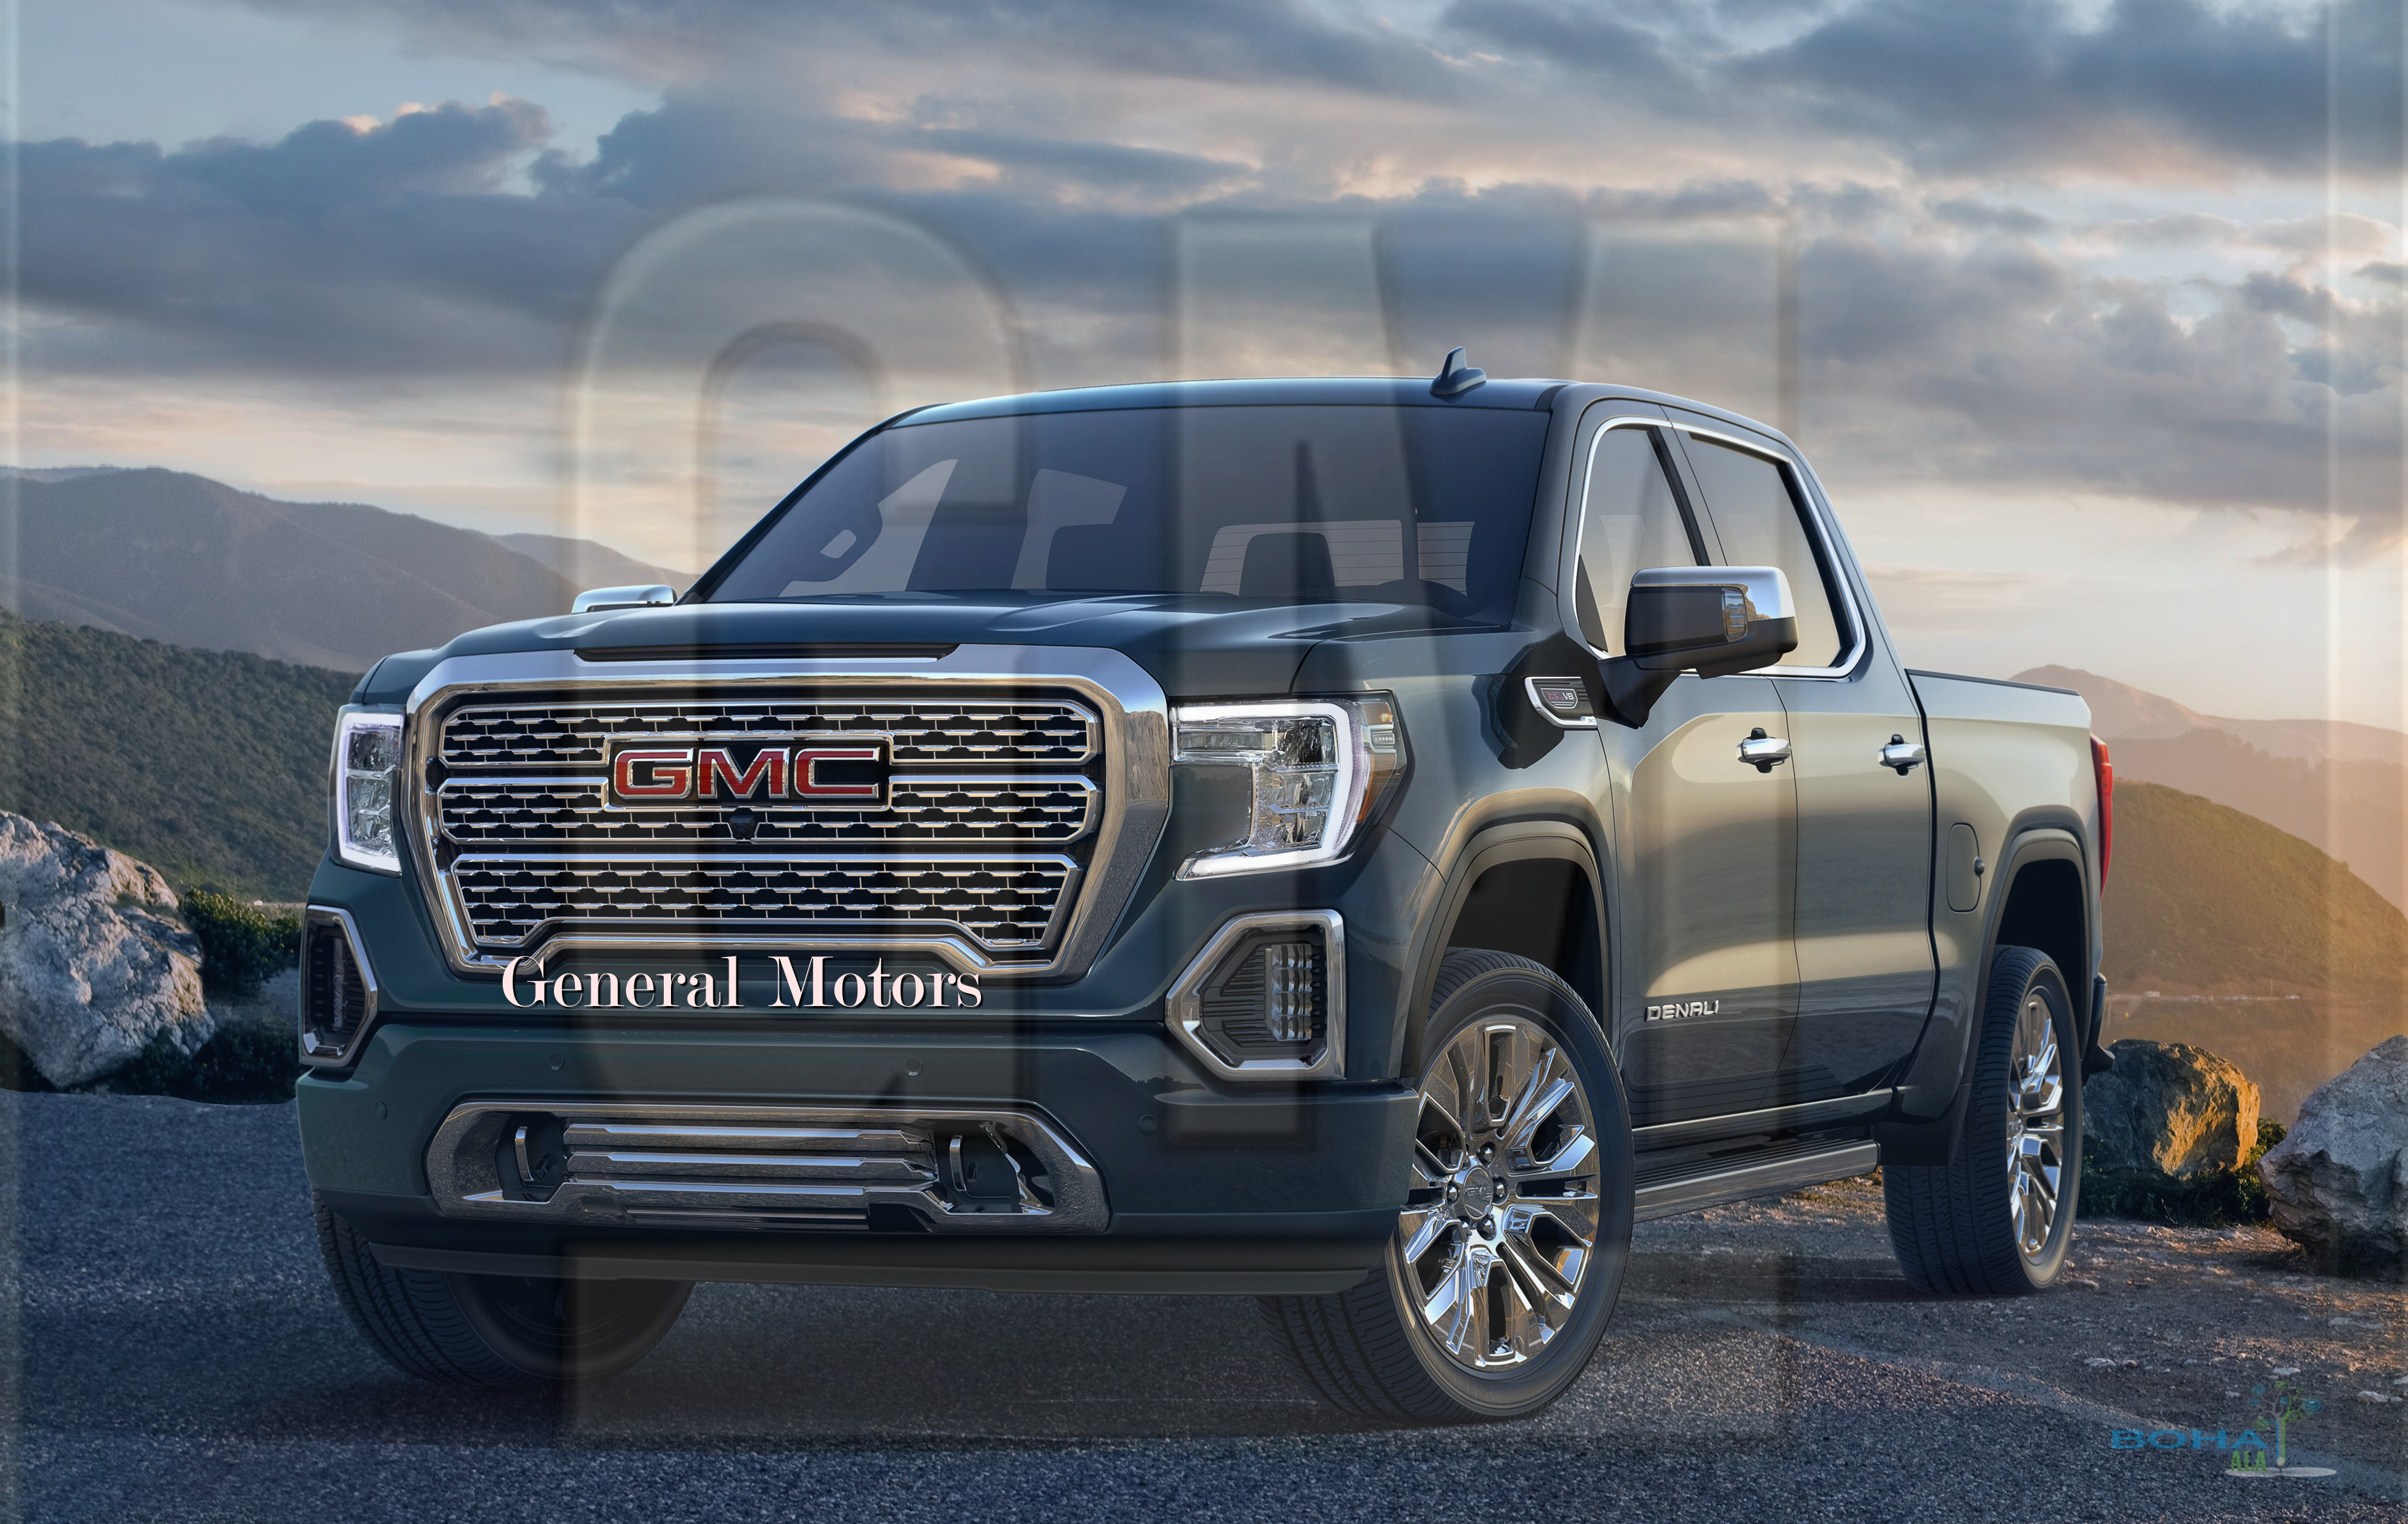 General Motors Marketing Case Study Analysis